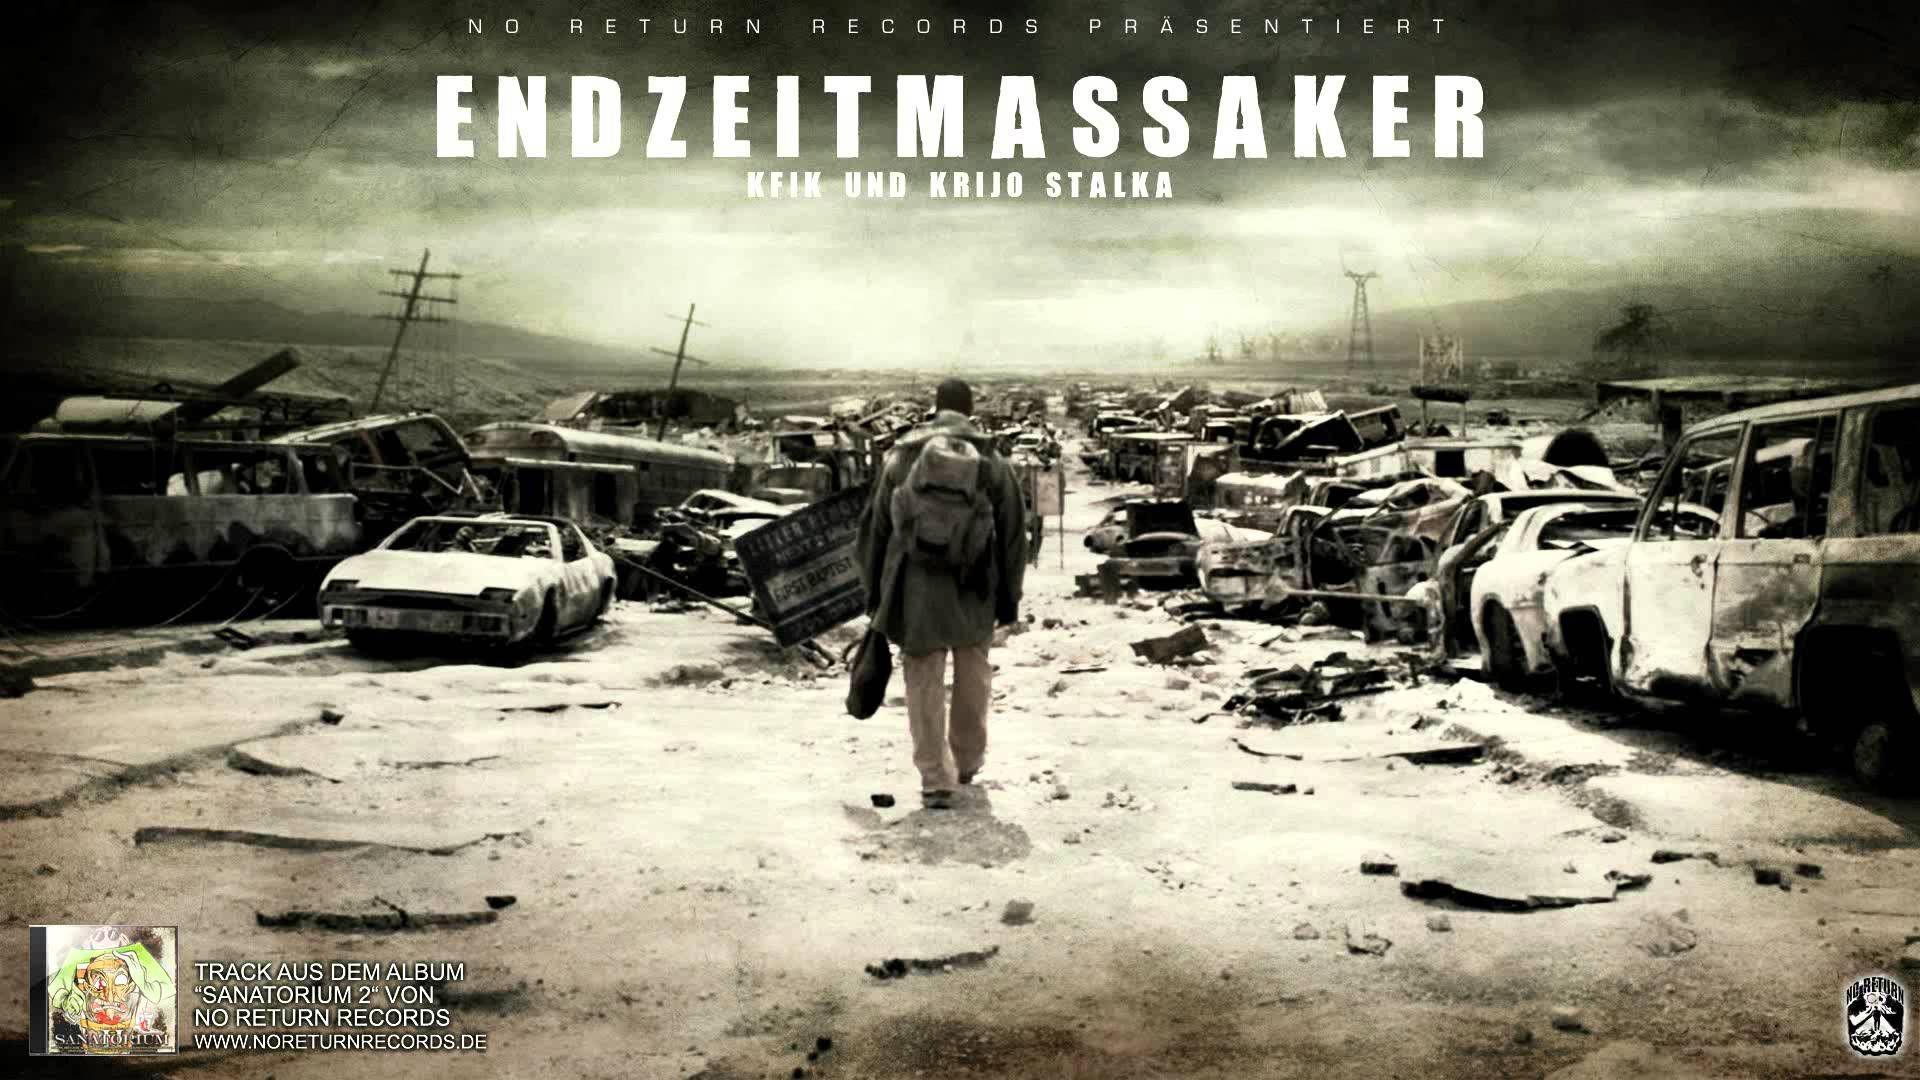 Deutsche Fik Filme